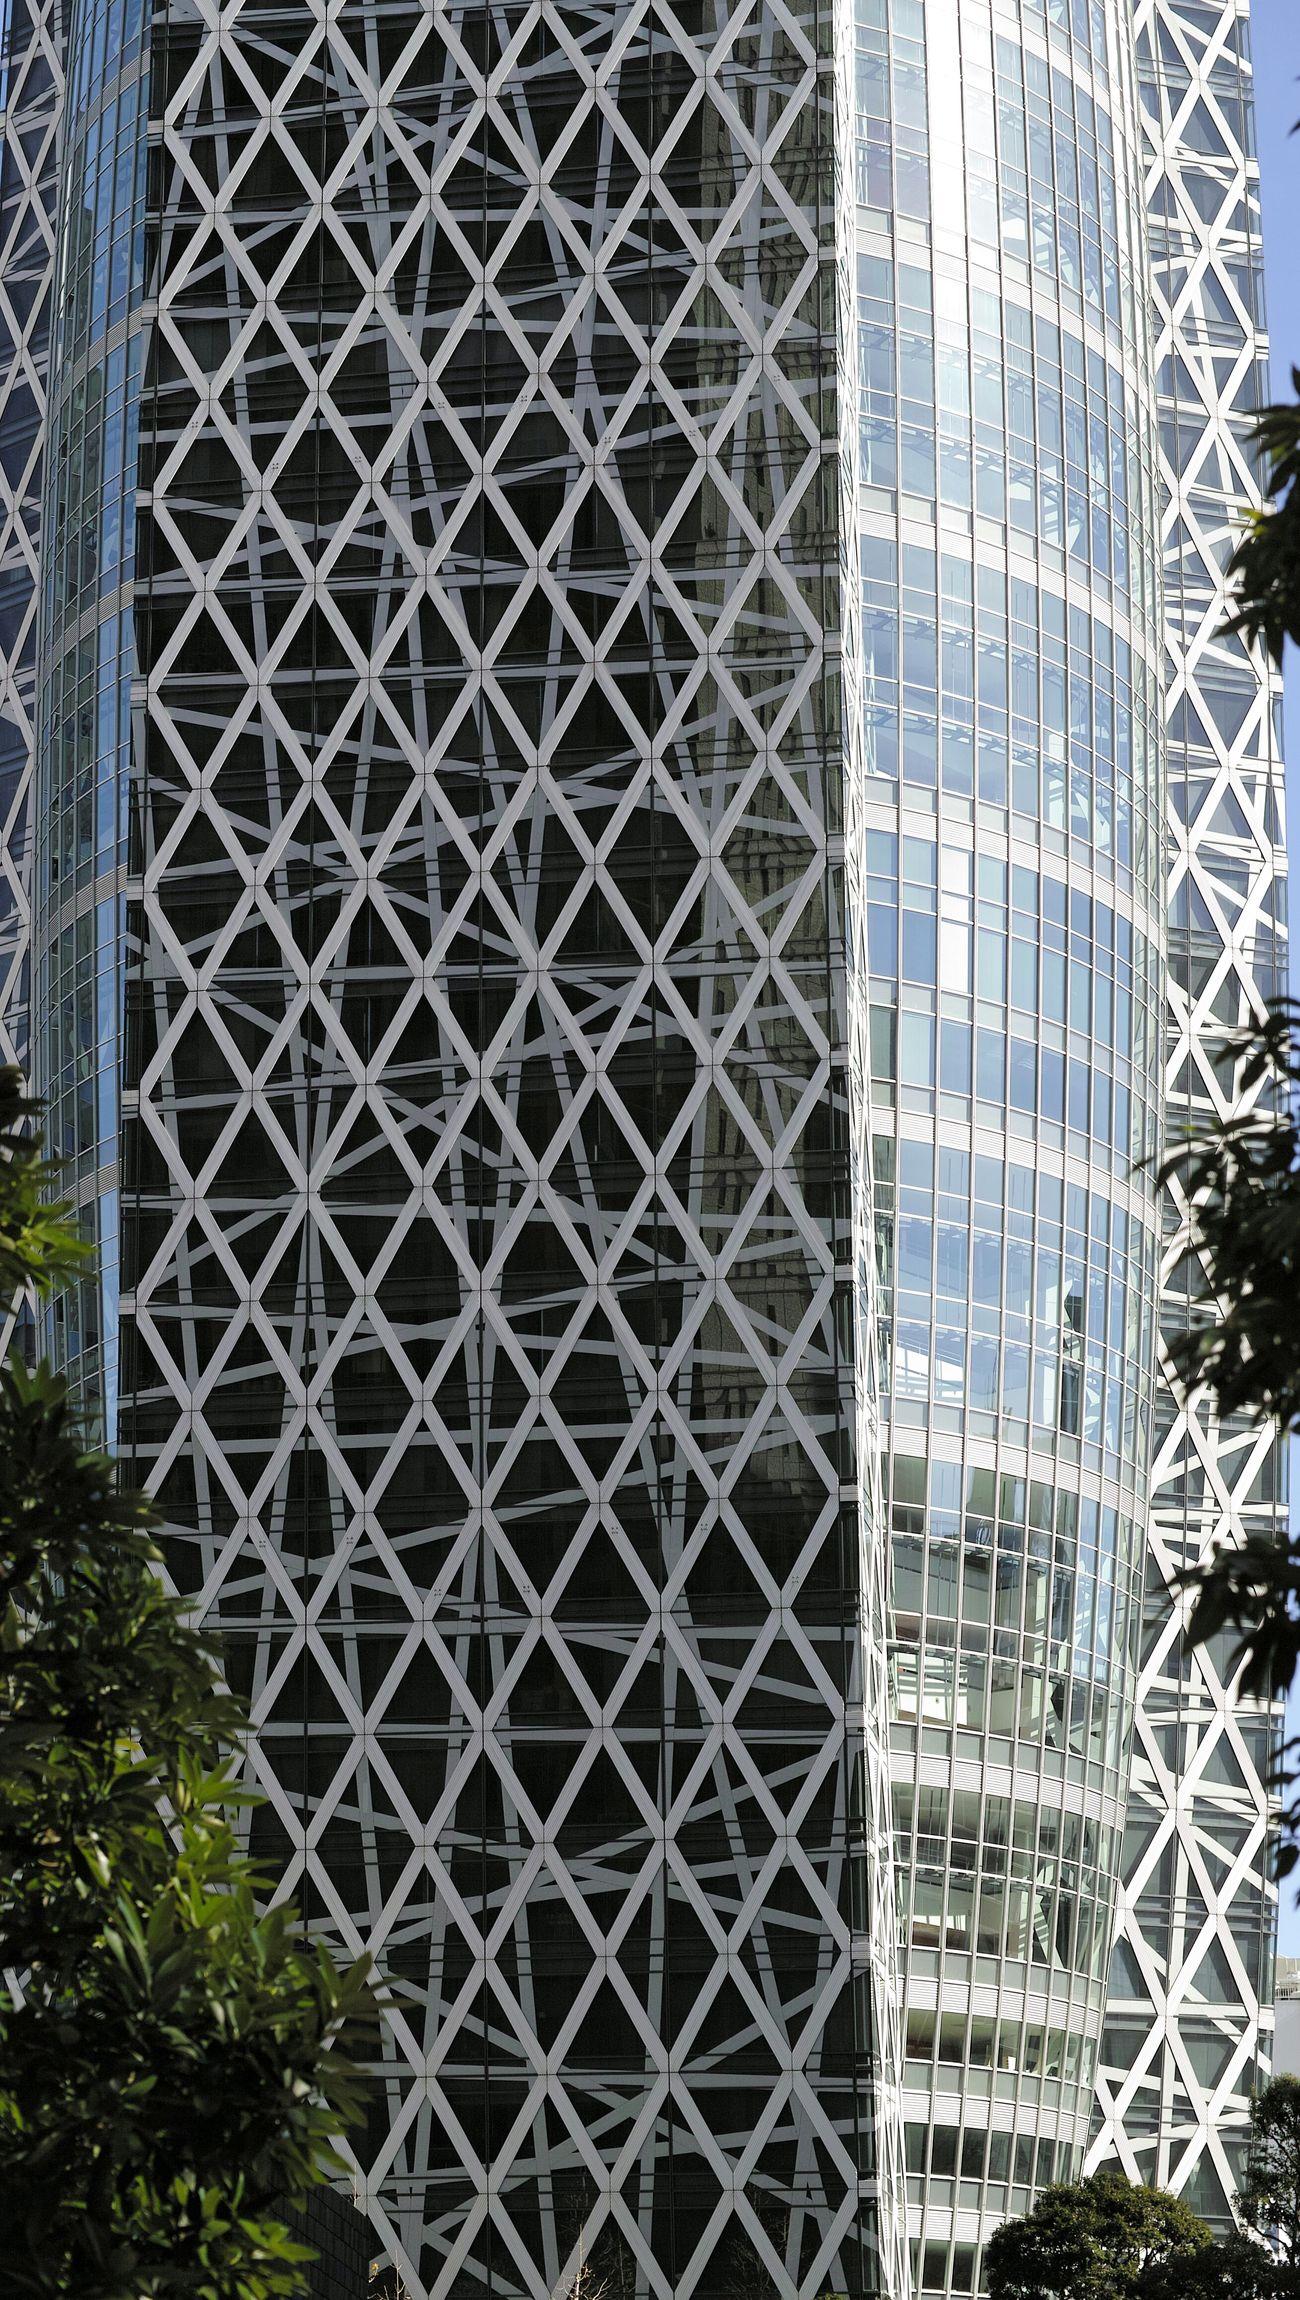 SHINJYUKU Landmark Geometric Building Architecture Urban Architecture Geometry Urban Geometry Amazing Architecture Geometric Architecture Tokyo,JapanEyeEm Best Shots EyeEmBestPics